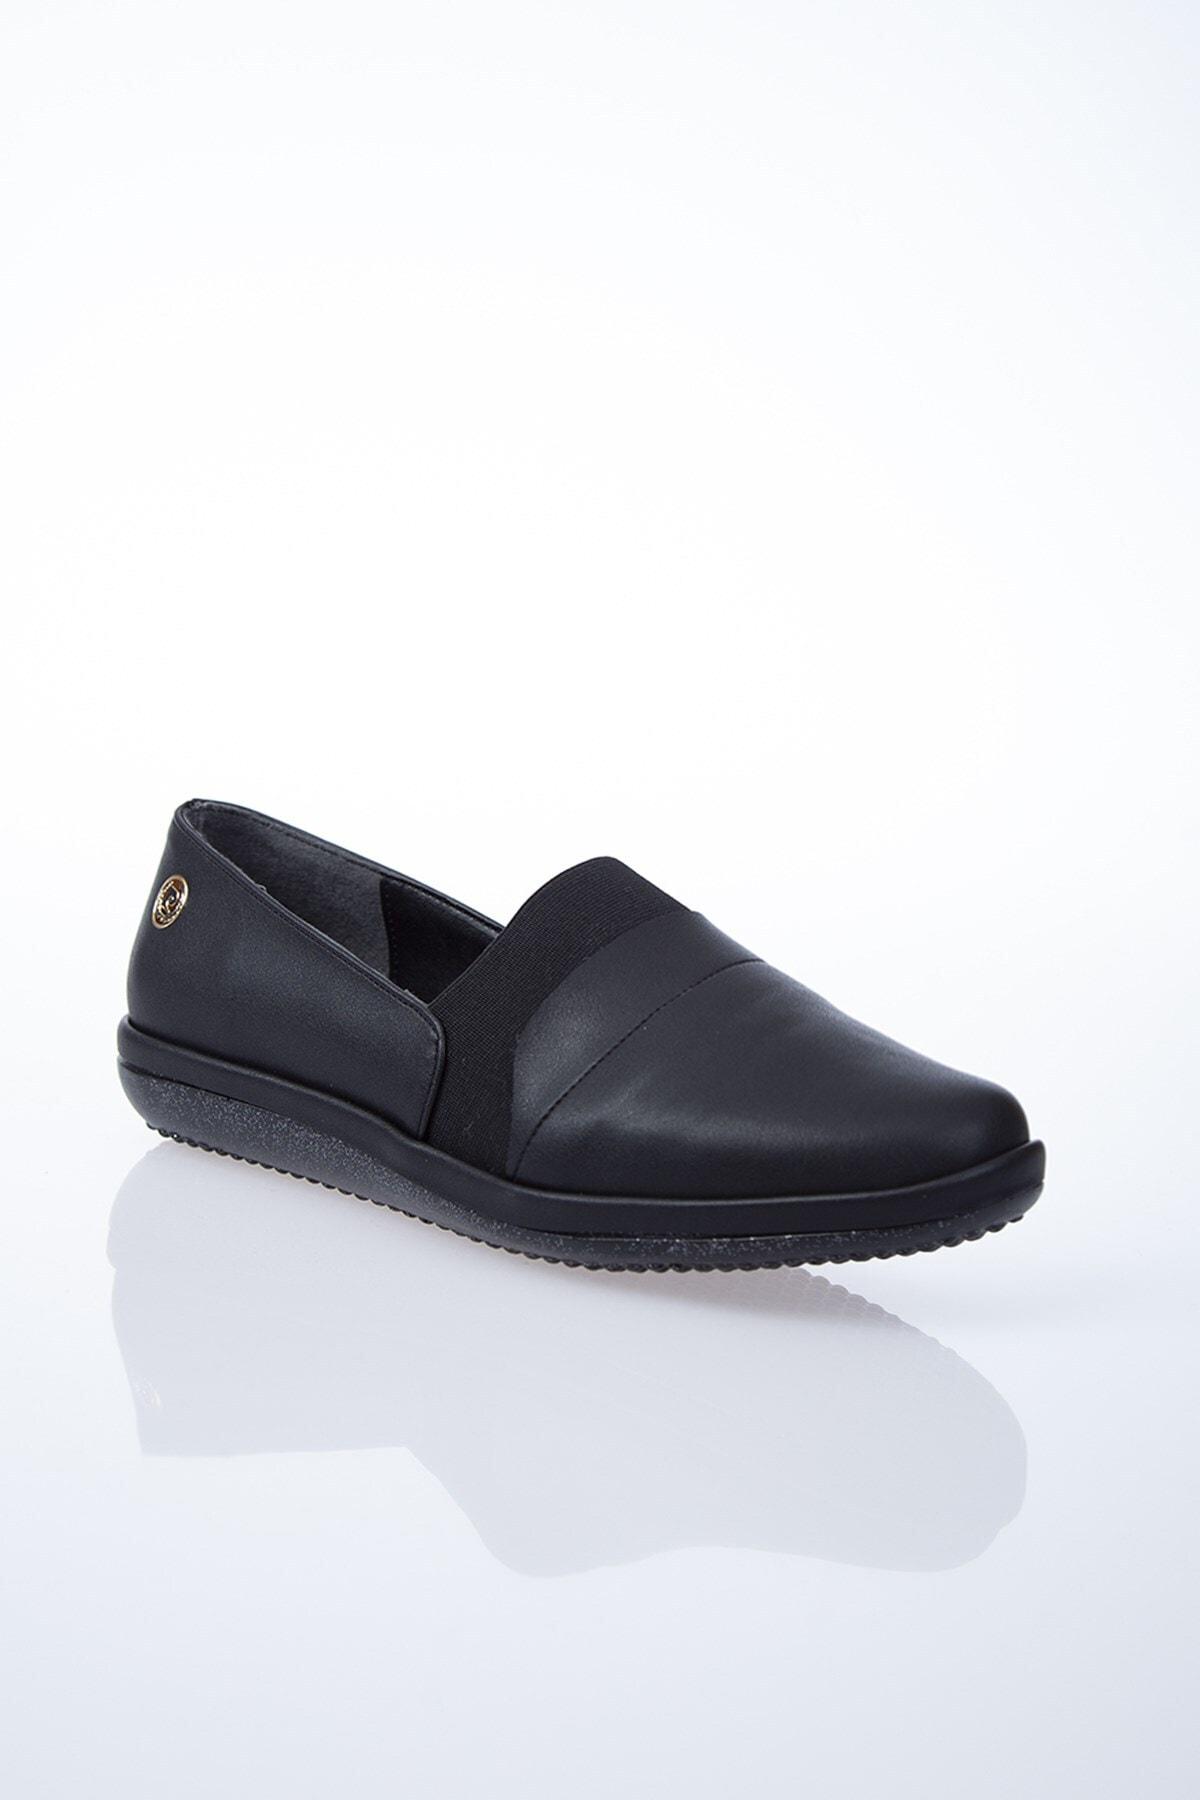 Pierre Cardin Pc-50095 - 3092-01-siyah 2